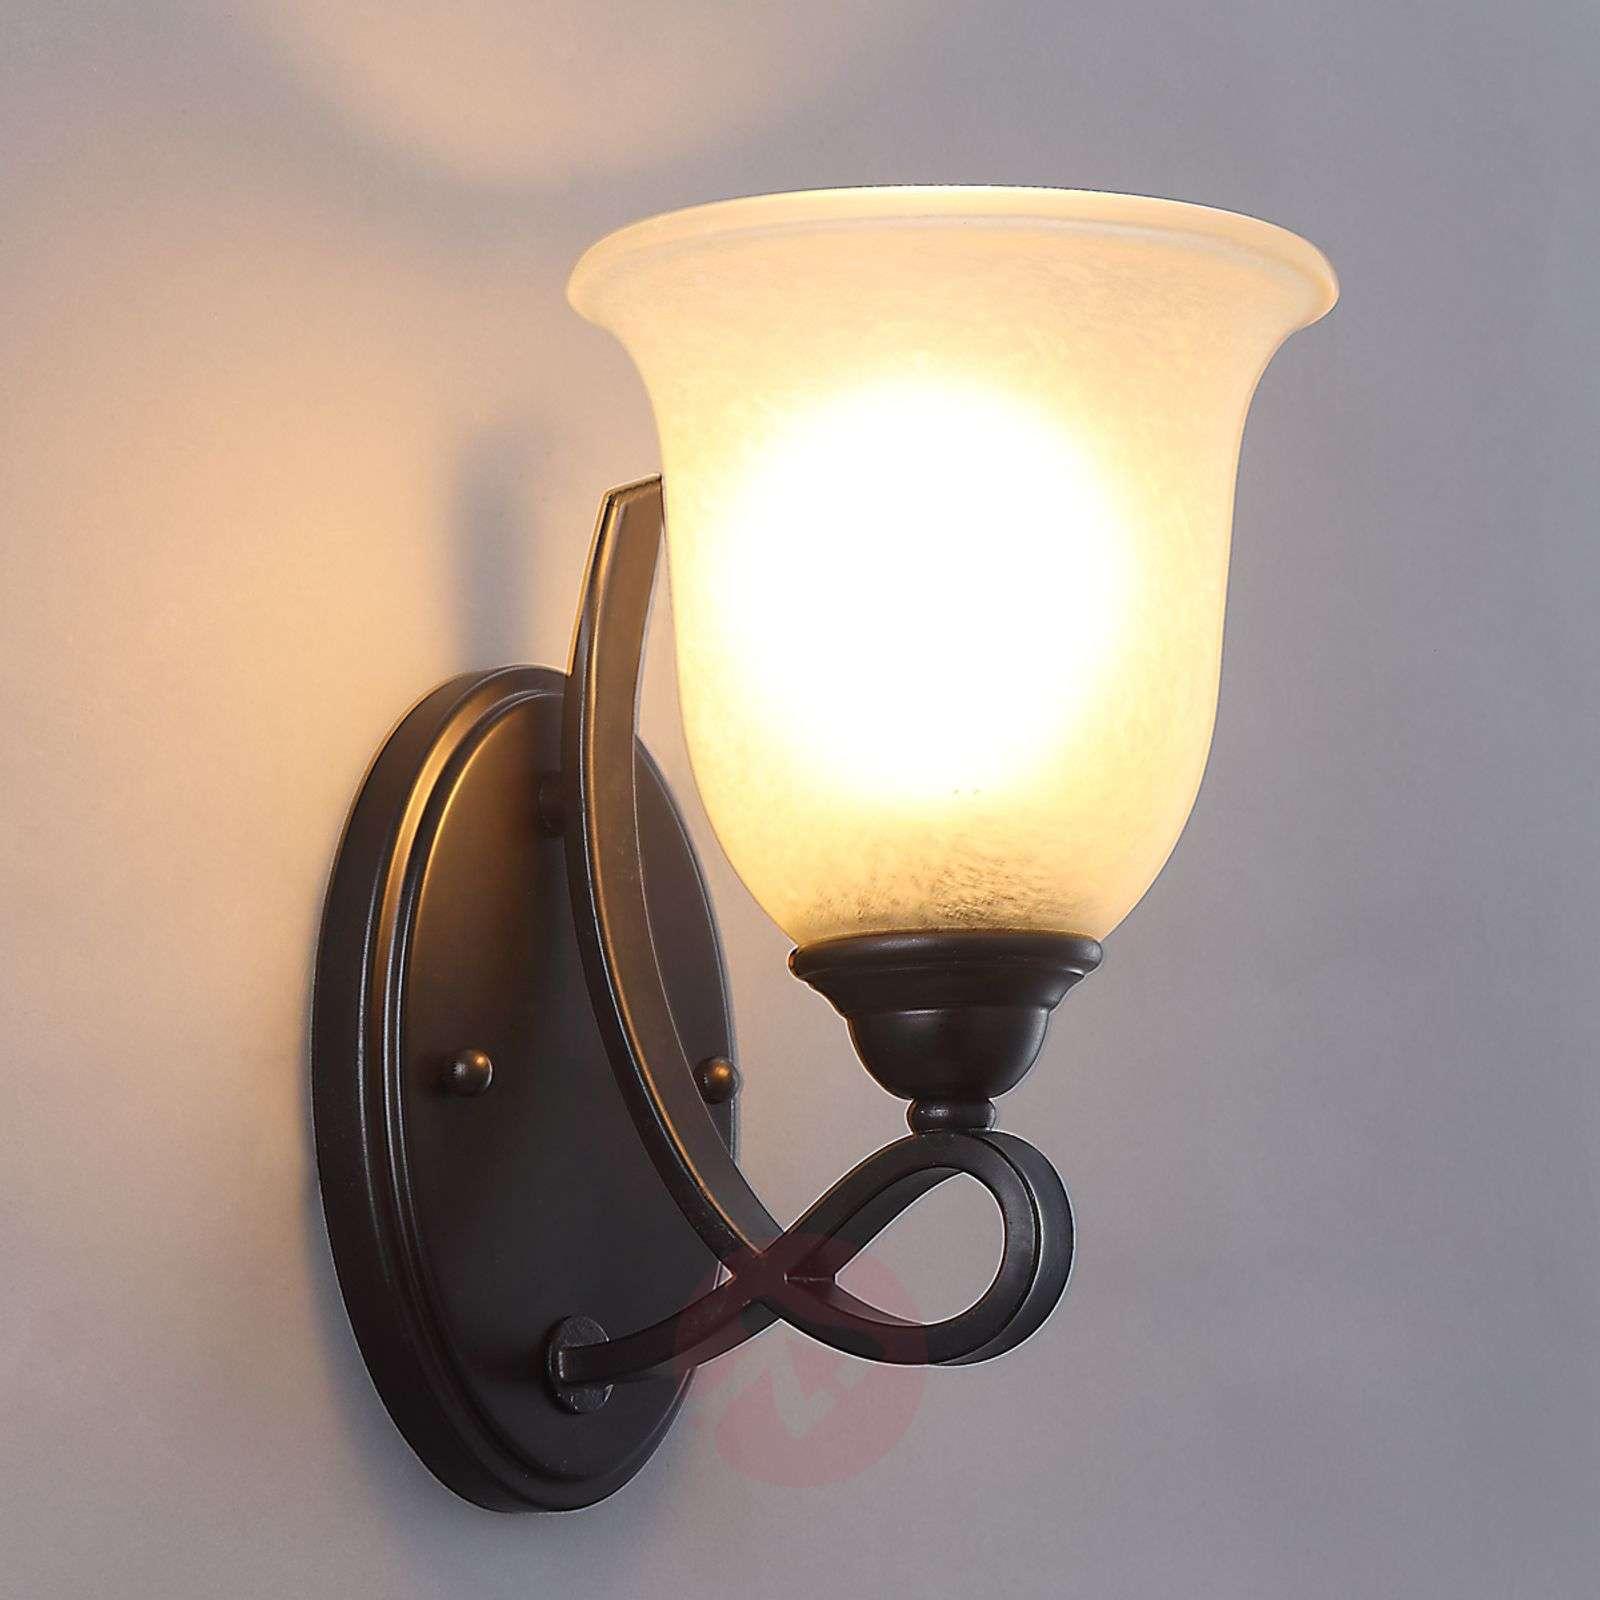 Elegant wall light Trisha-9620343-01